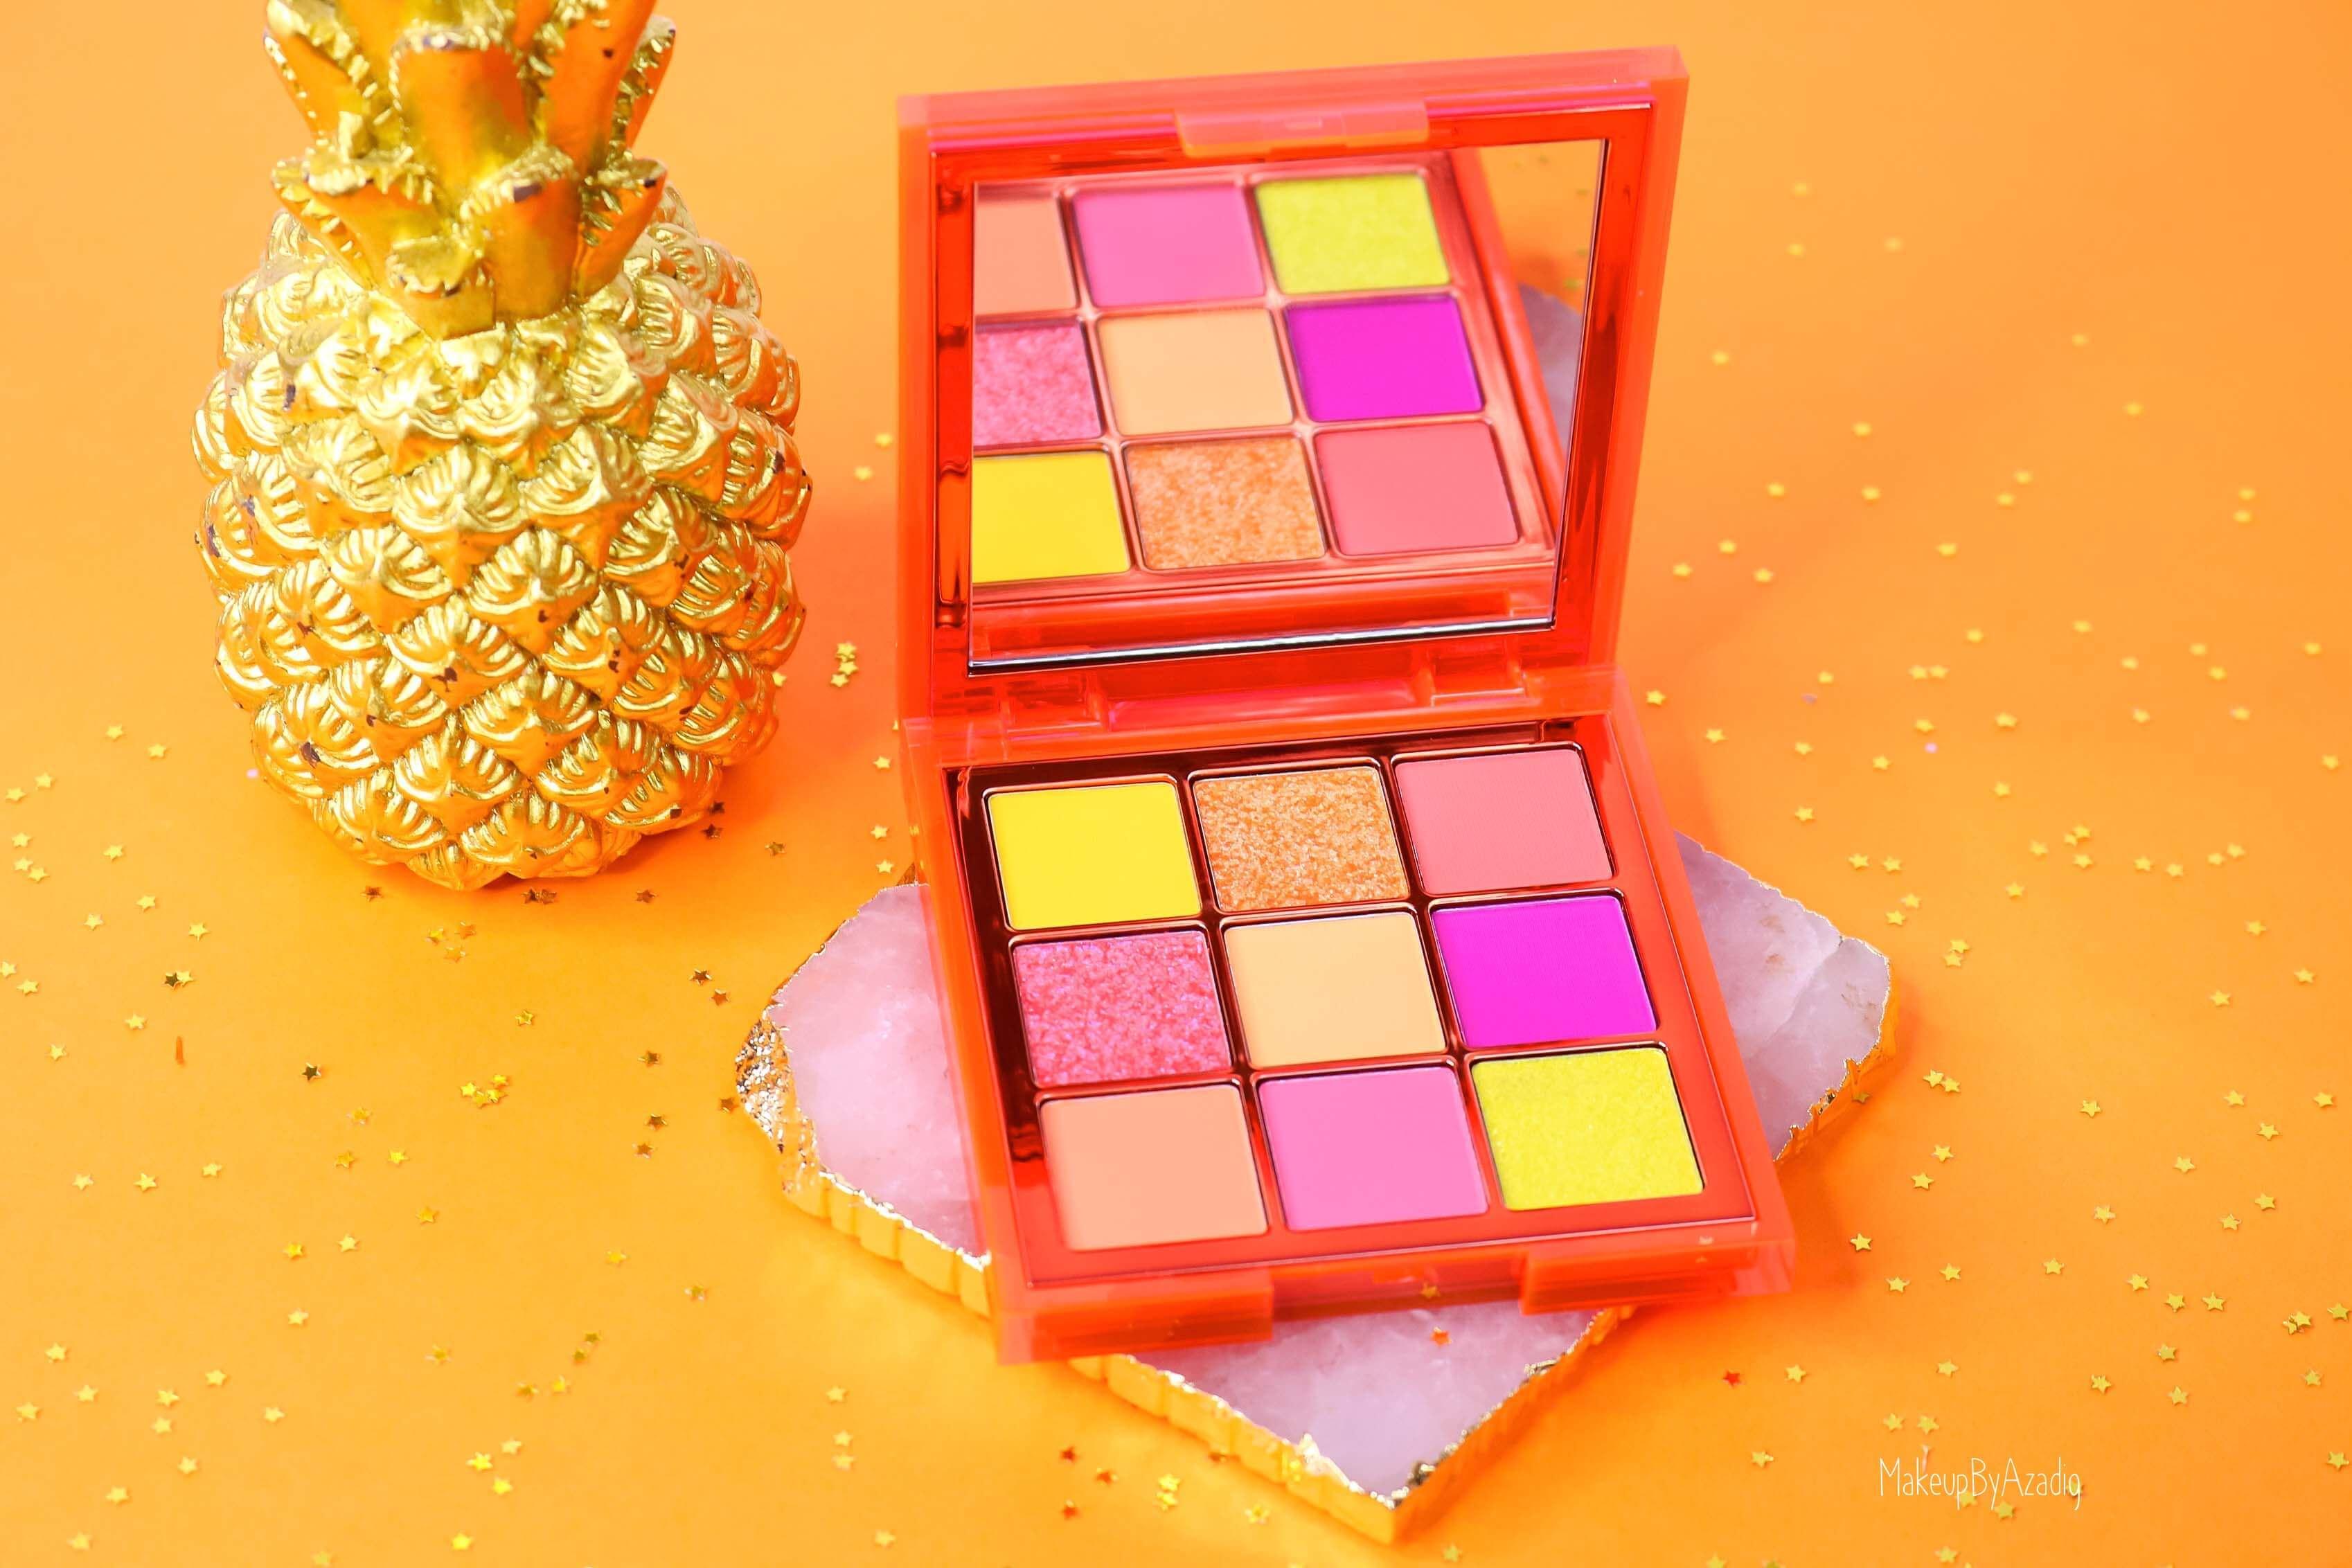 revue-review-palette-neon-obsession-huda-beauty-orange-pink-green-neon-palette-fard-paupieres-fluo-swatch-avis-prix-makeupbyazadig-hudaboss